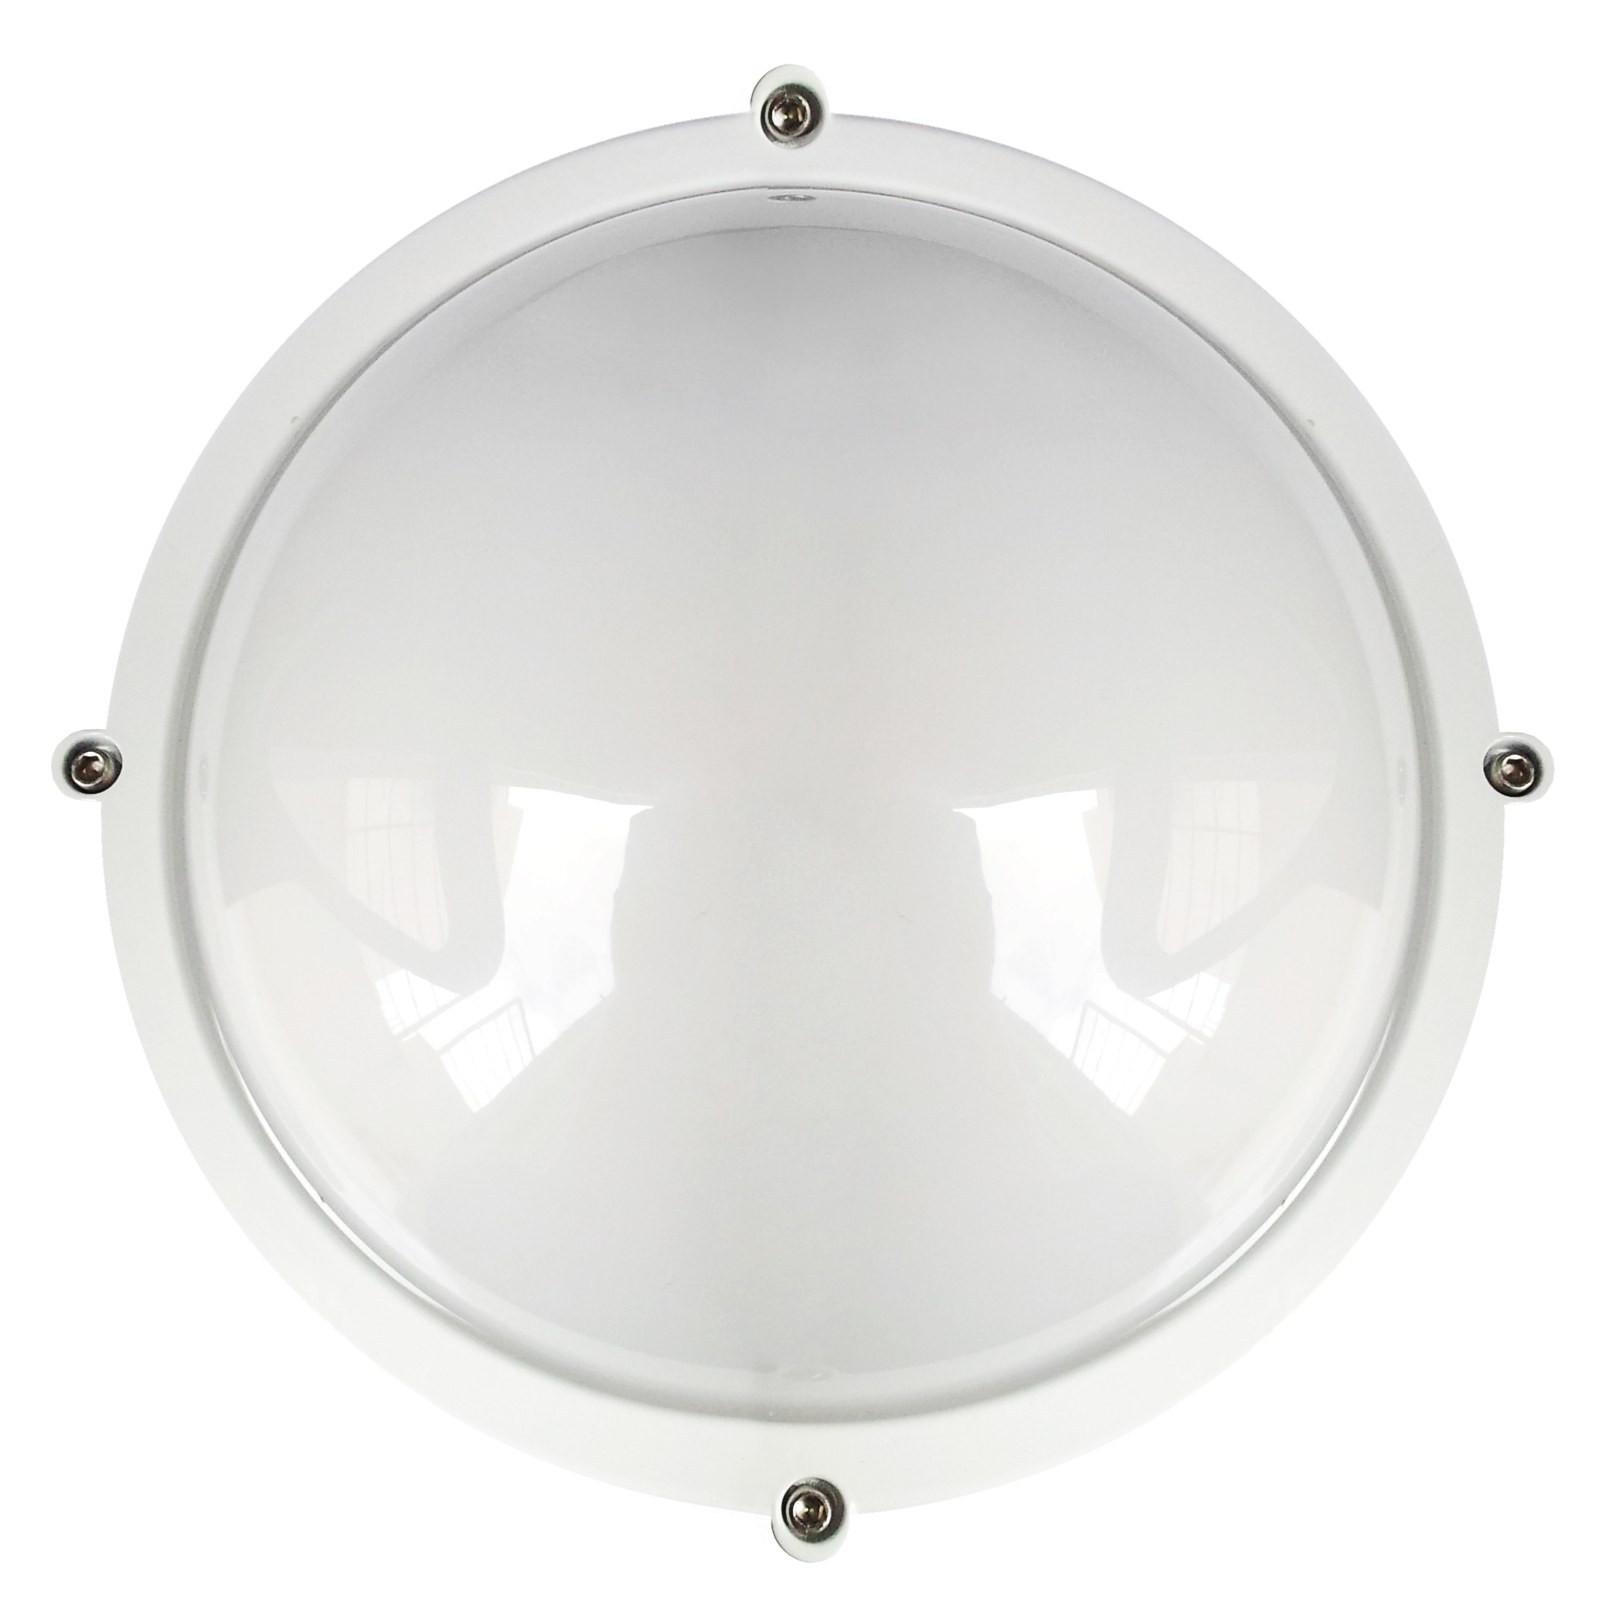 LAMPADA PLAFONIERA A LED PER ESTERNO 12 W IP65 ROTONDA LUCE NATURA NATURALE LIFE Vultech Life ...